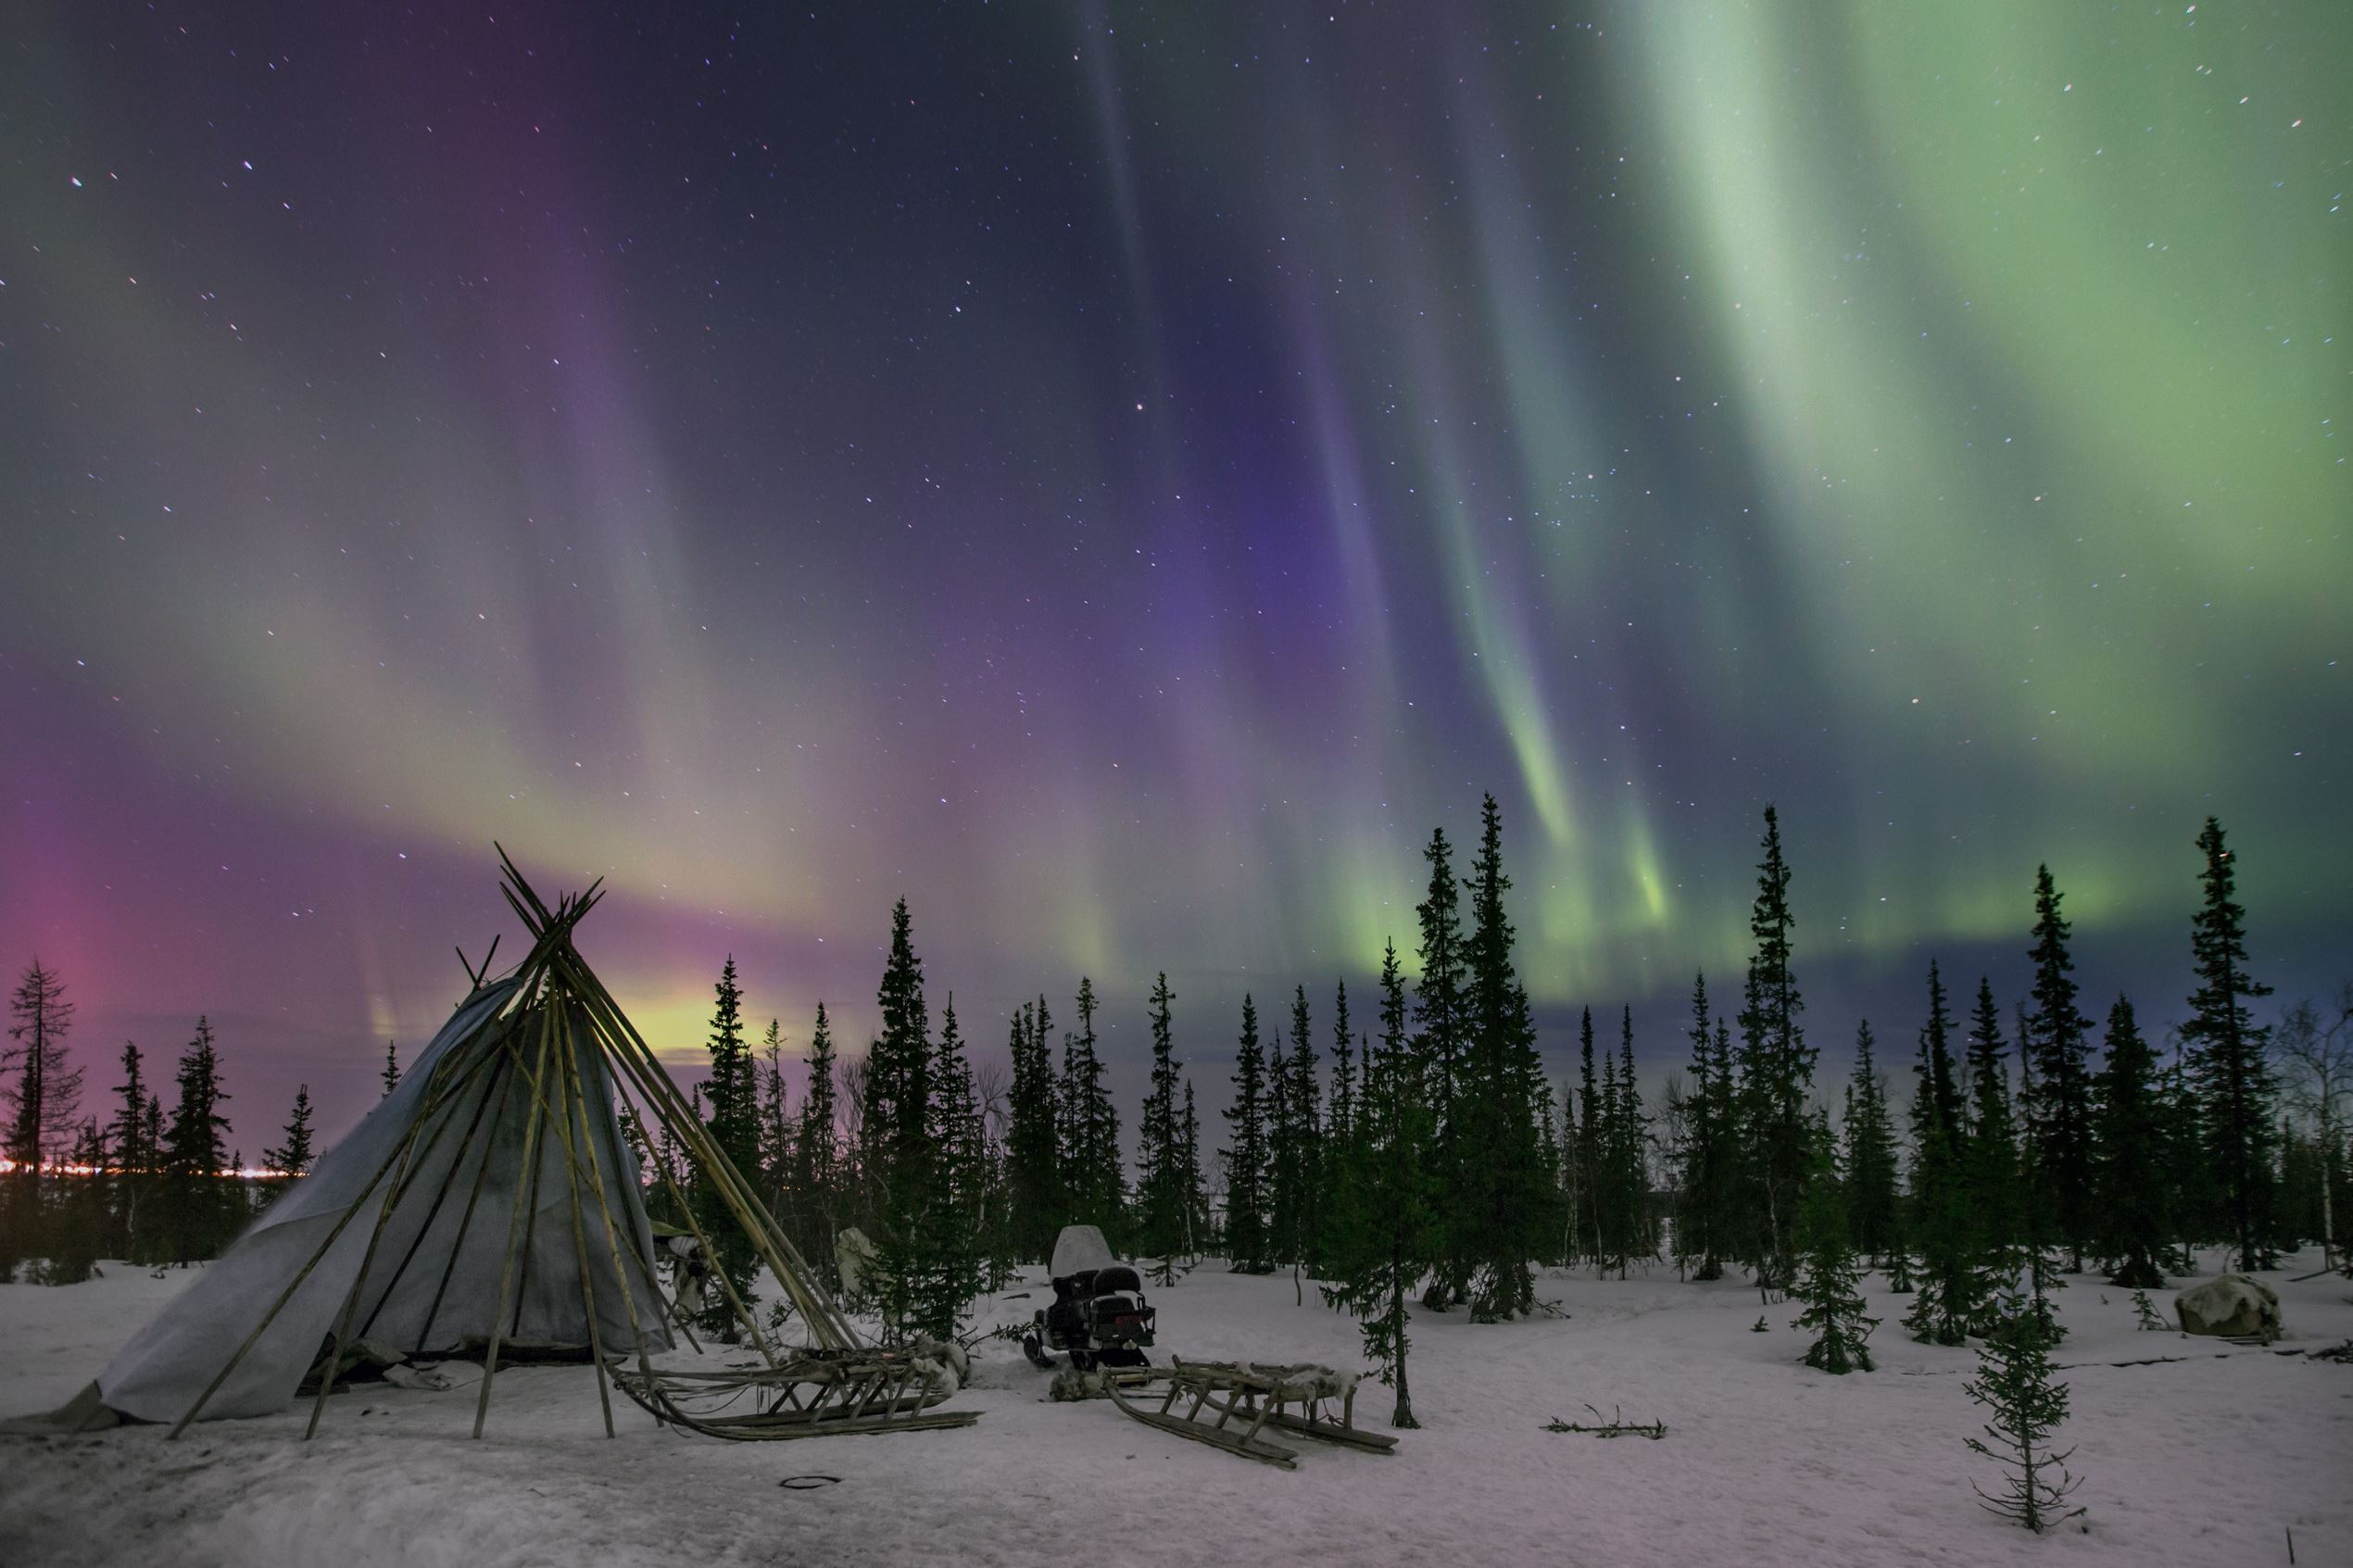 Слайд 33 из 86: YAMALO, RUSSIA - APRIL 08: Northern Lights seen near the town of Salekhard, Yamalo-Nenets Autonomous Okrug, Russia on April 08, 2016.  (Photo by Sergey Anisimov /Anadolu Agency/Getty Images)